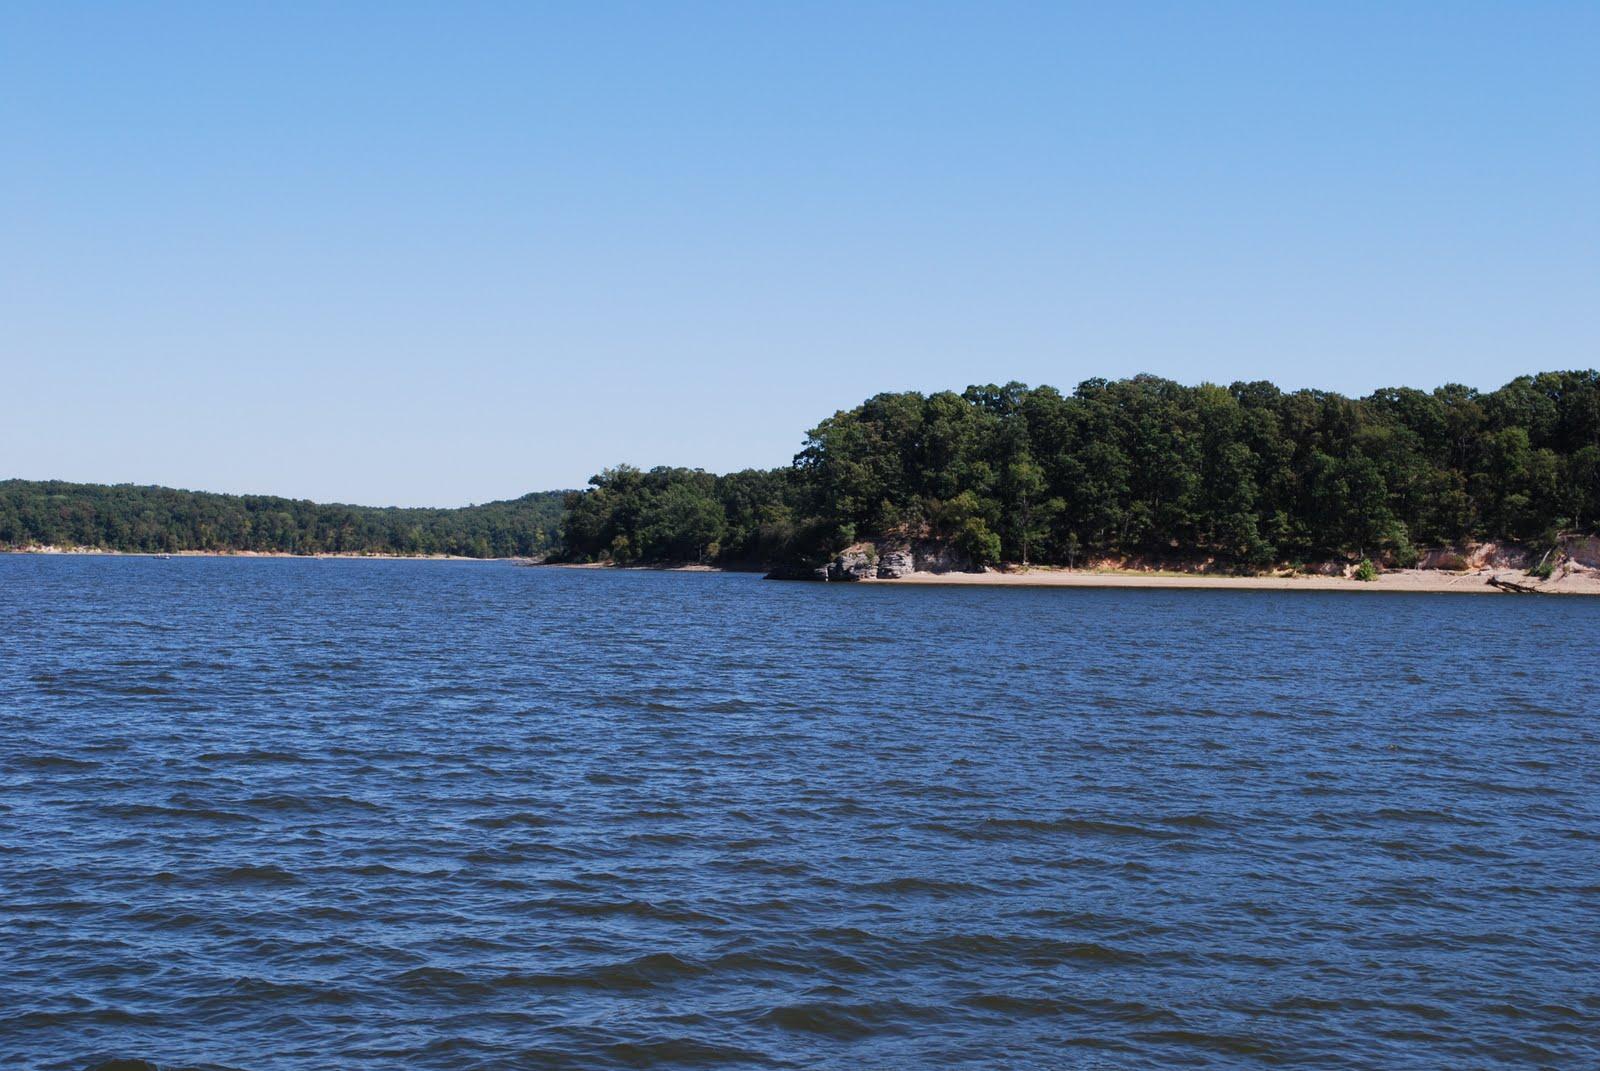 Solitude tennessee river and kentucky lake for Kentucky lake fishing